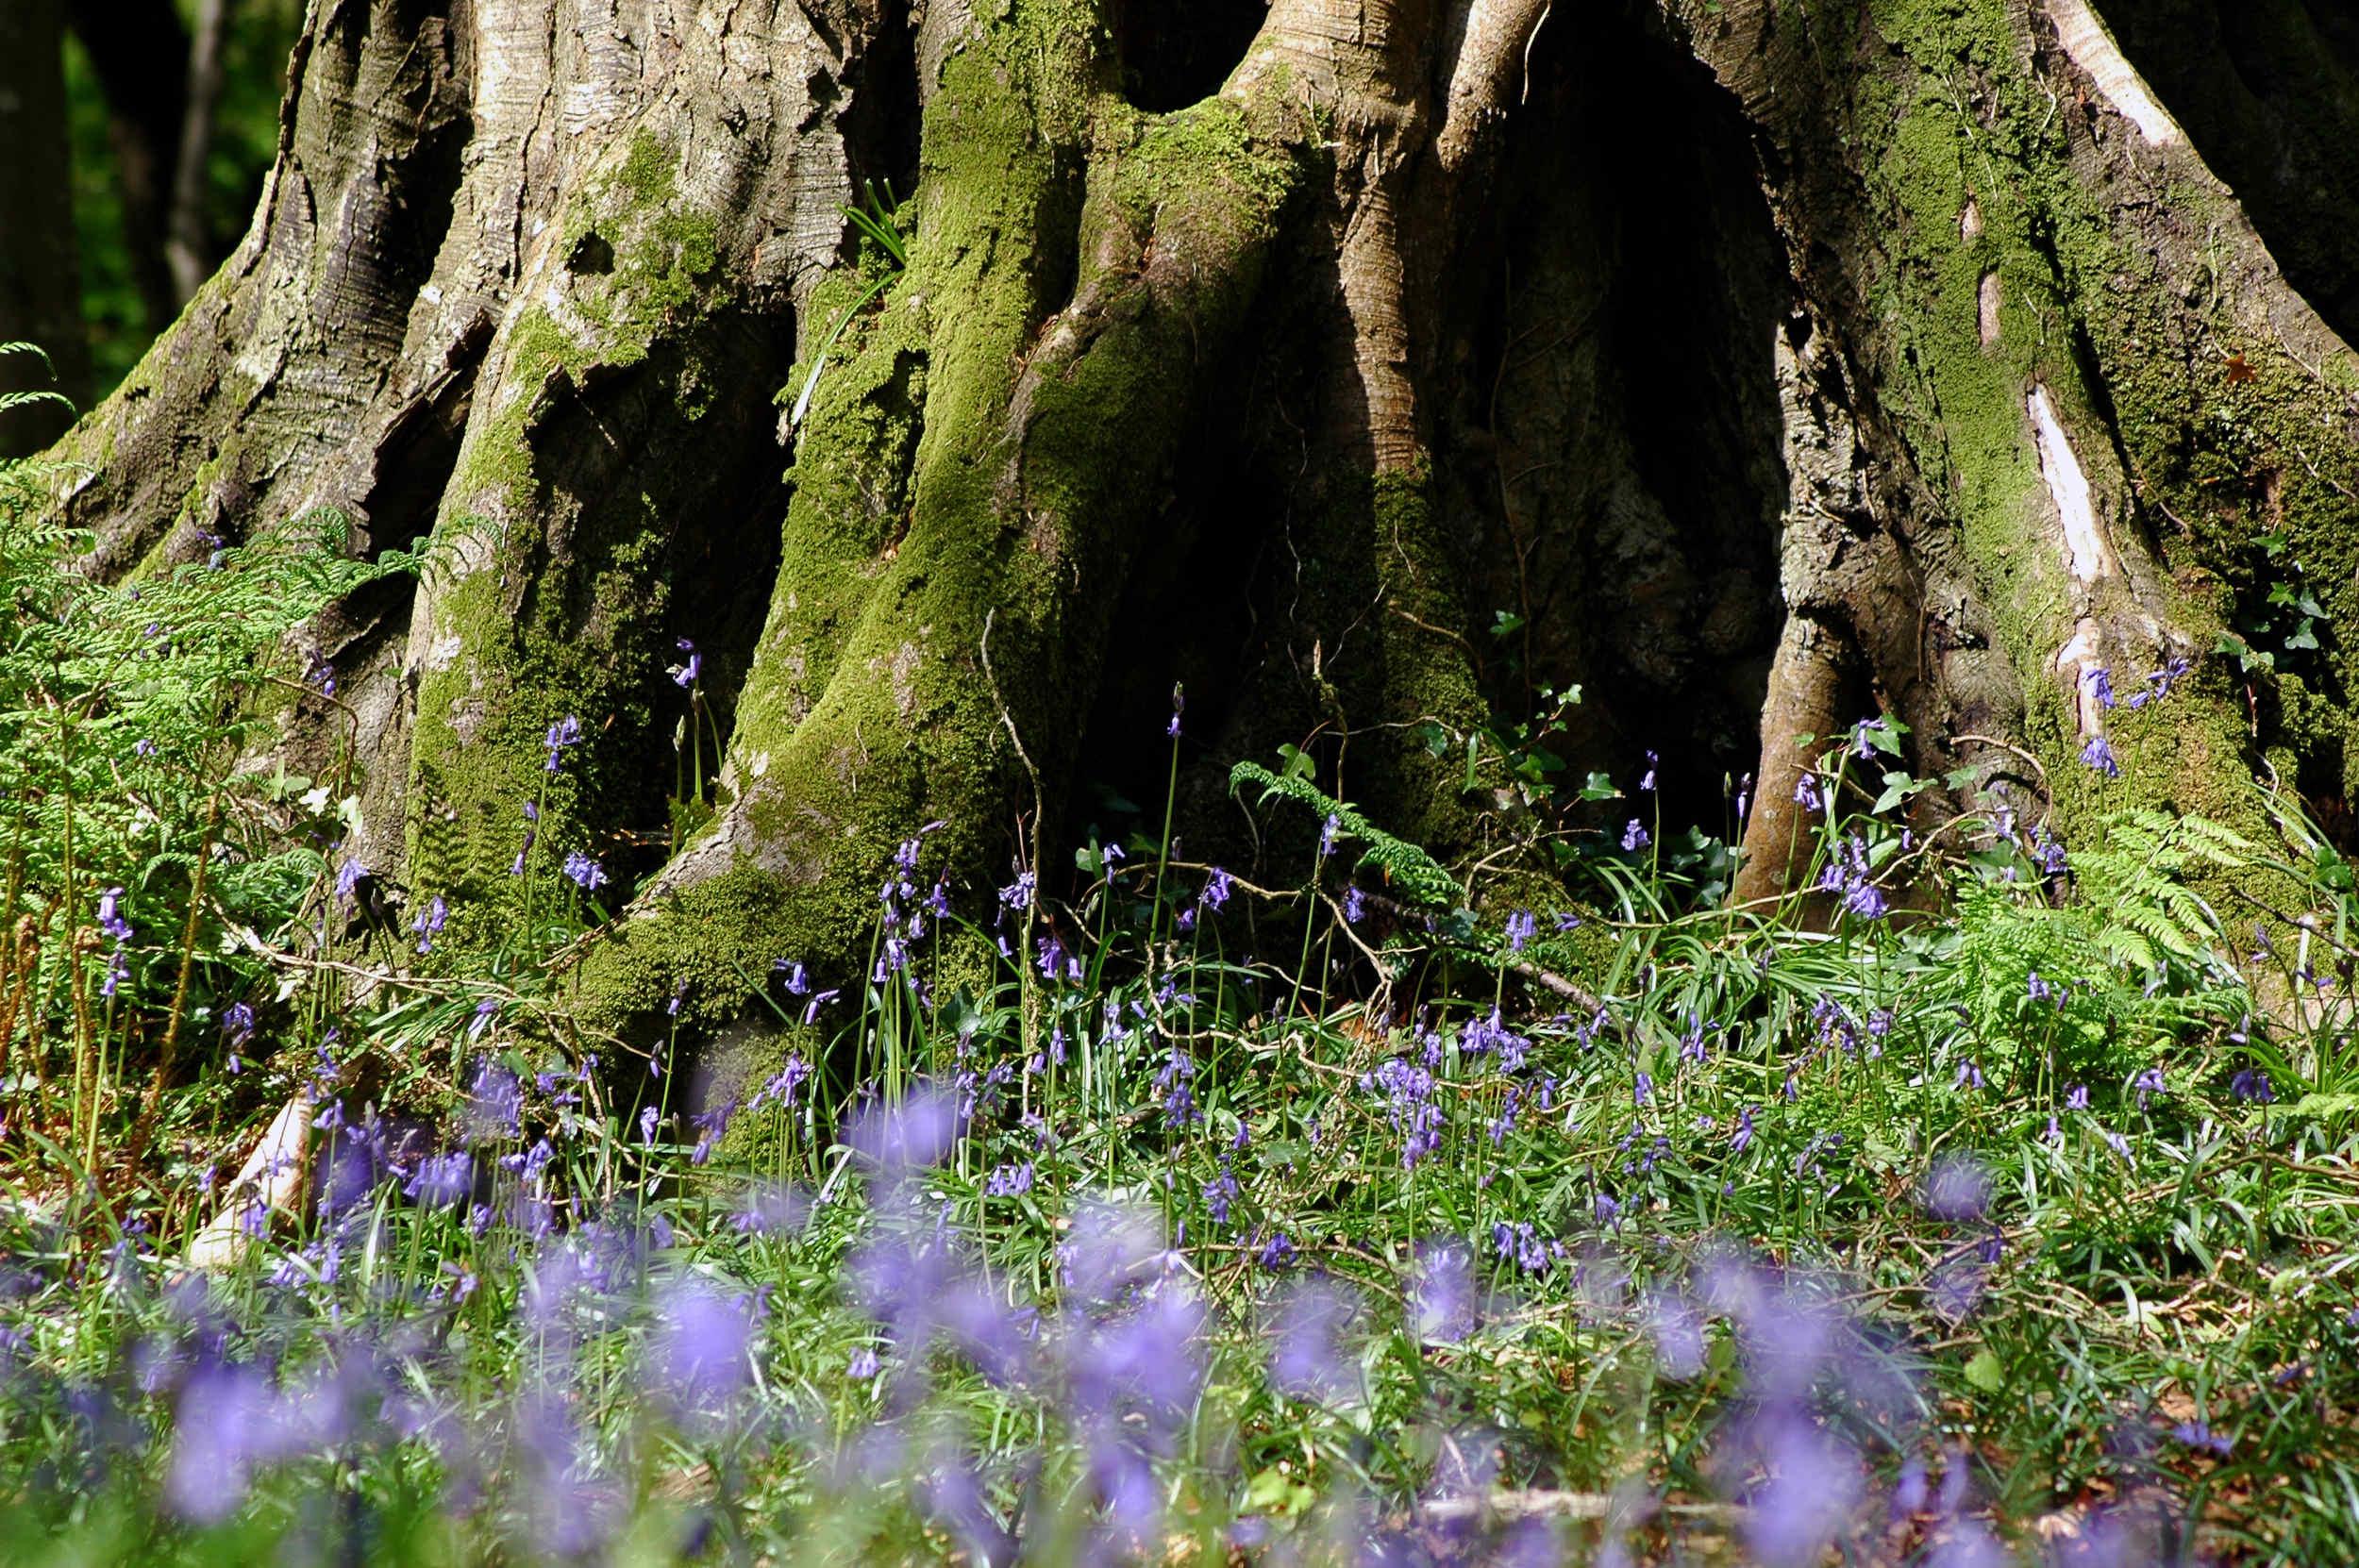 Bluebells in bloom in Ballaglass Glen